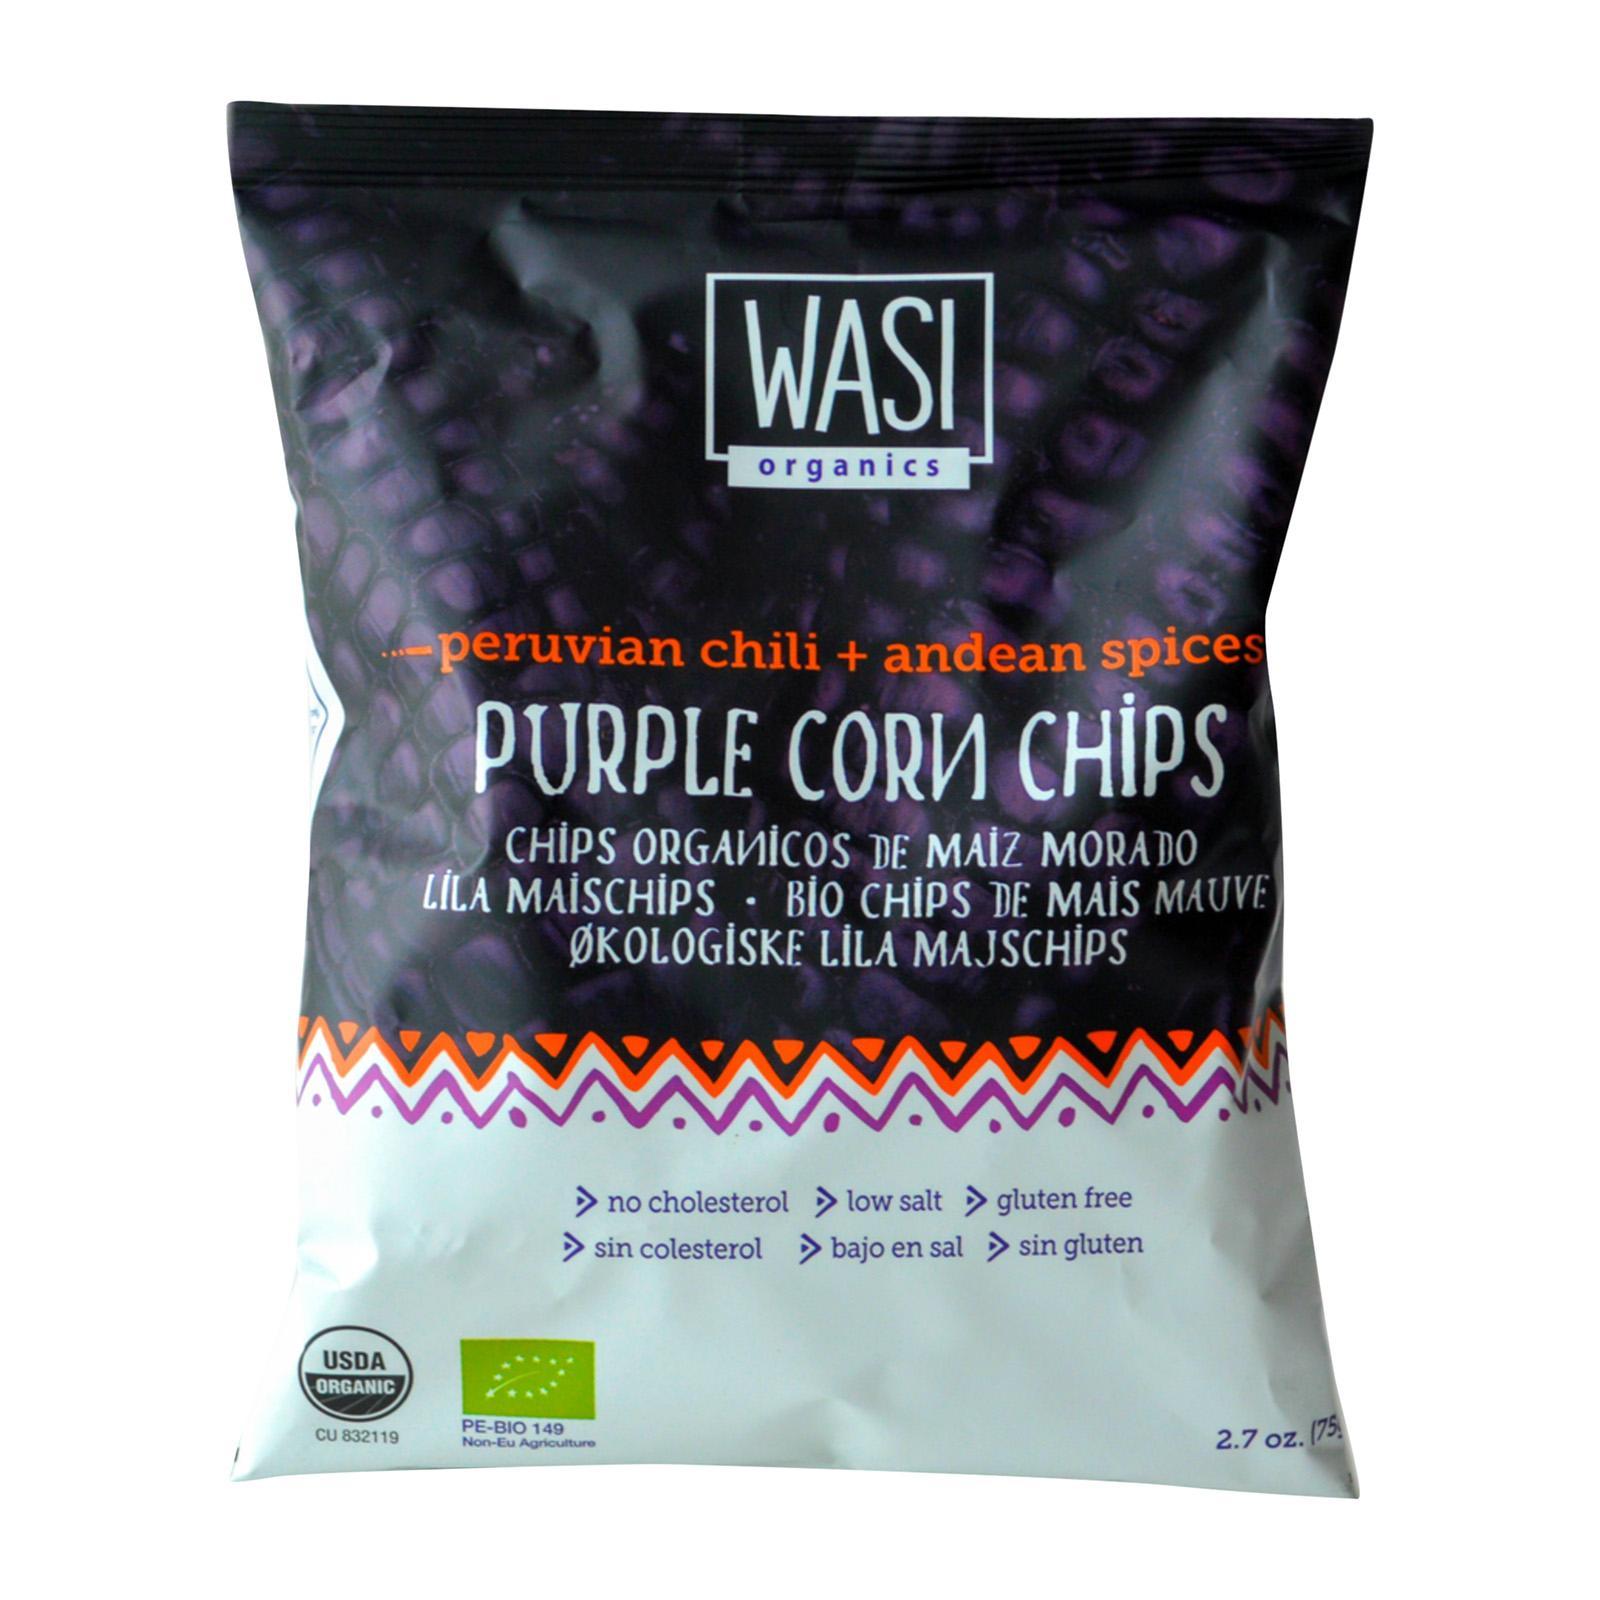 Purple Corn Chips - Wasi Organics